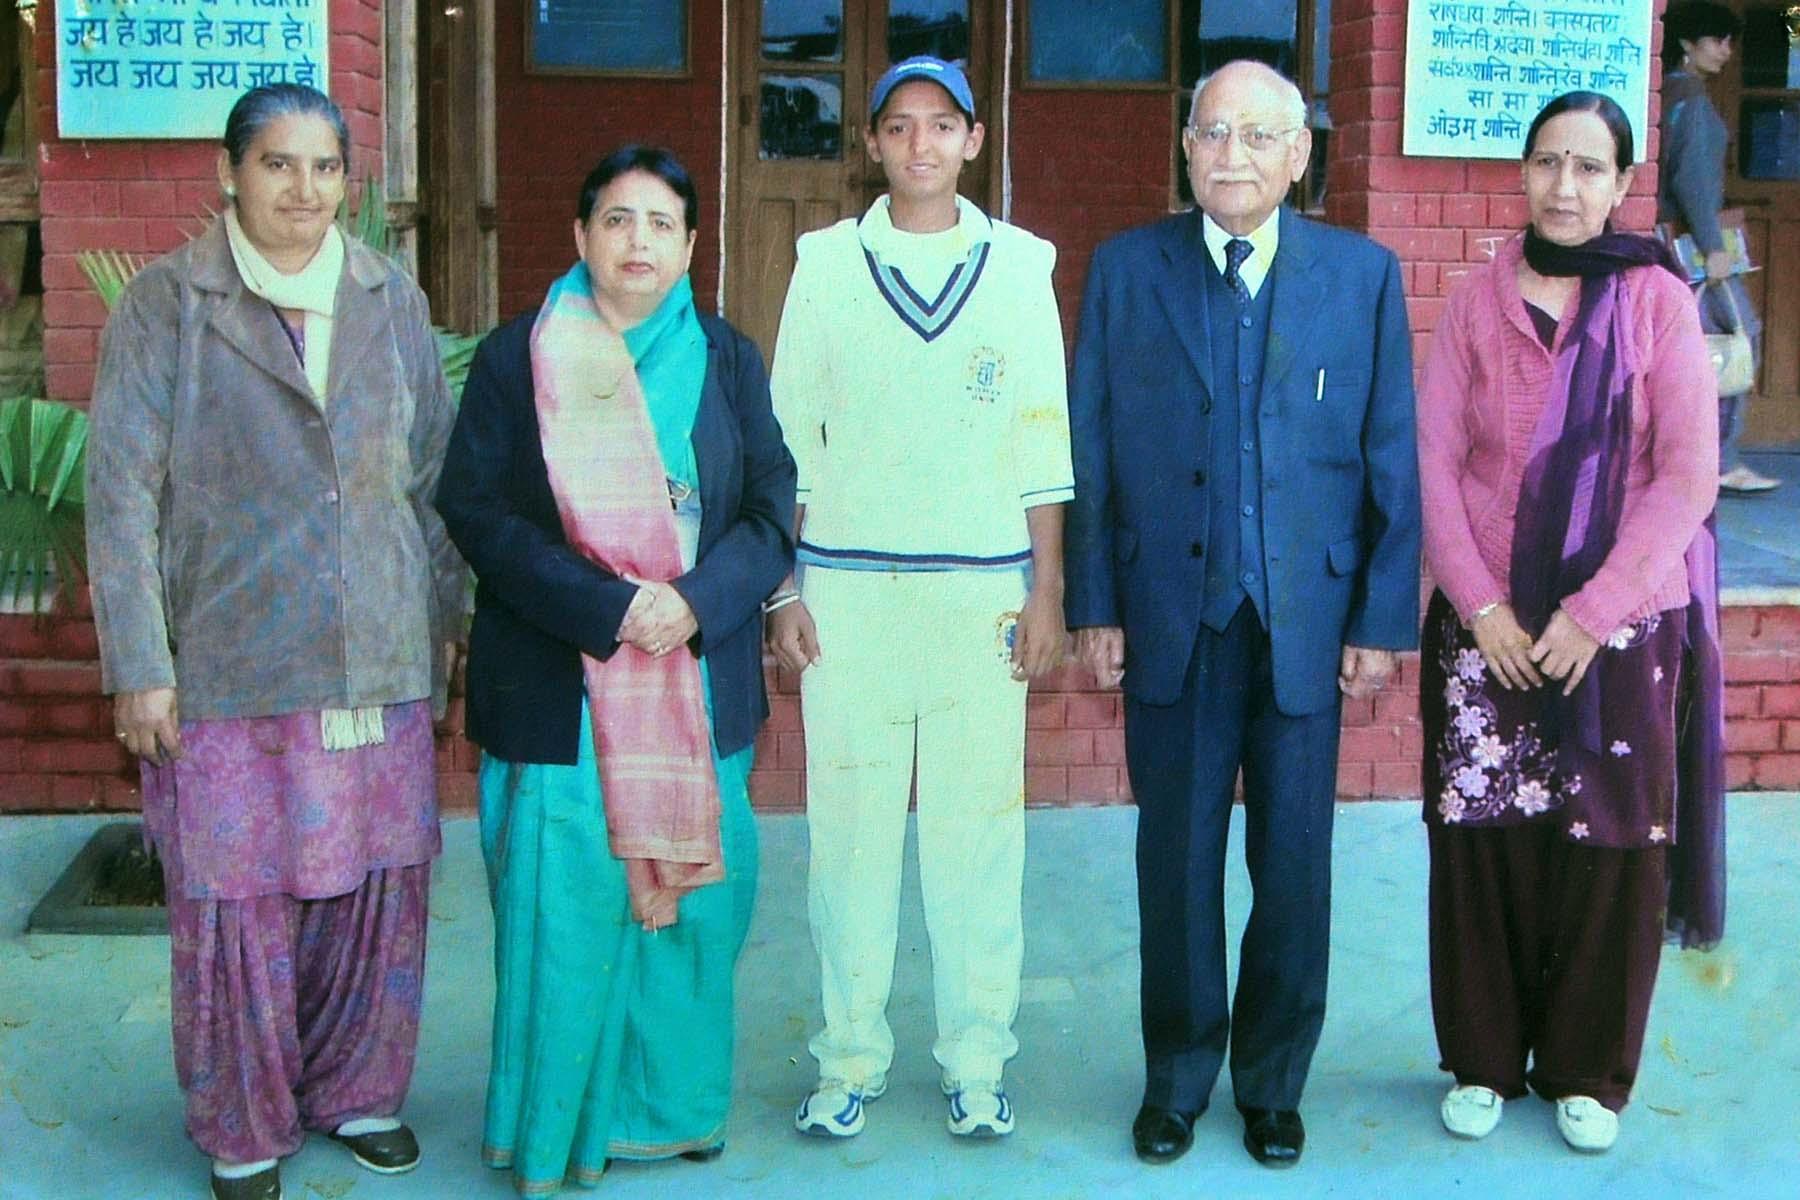 HMV feels proud of its alumnae Harmanpreet Kaur  scored 171 runs (not out) in ICC World Cup Semi Finals